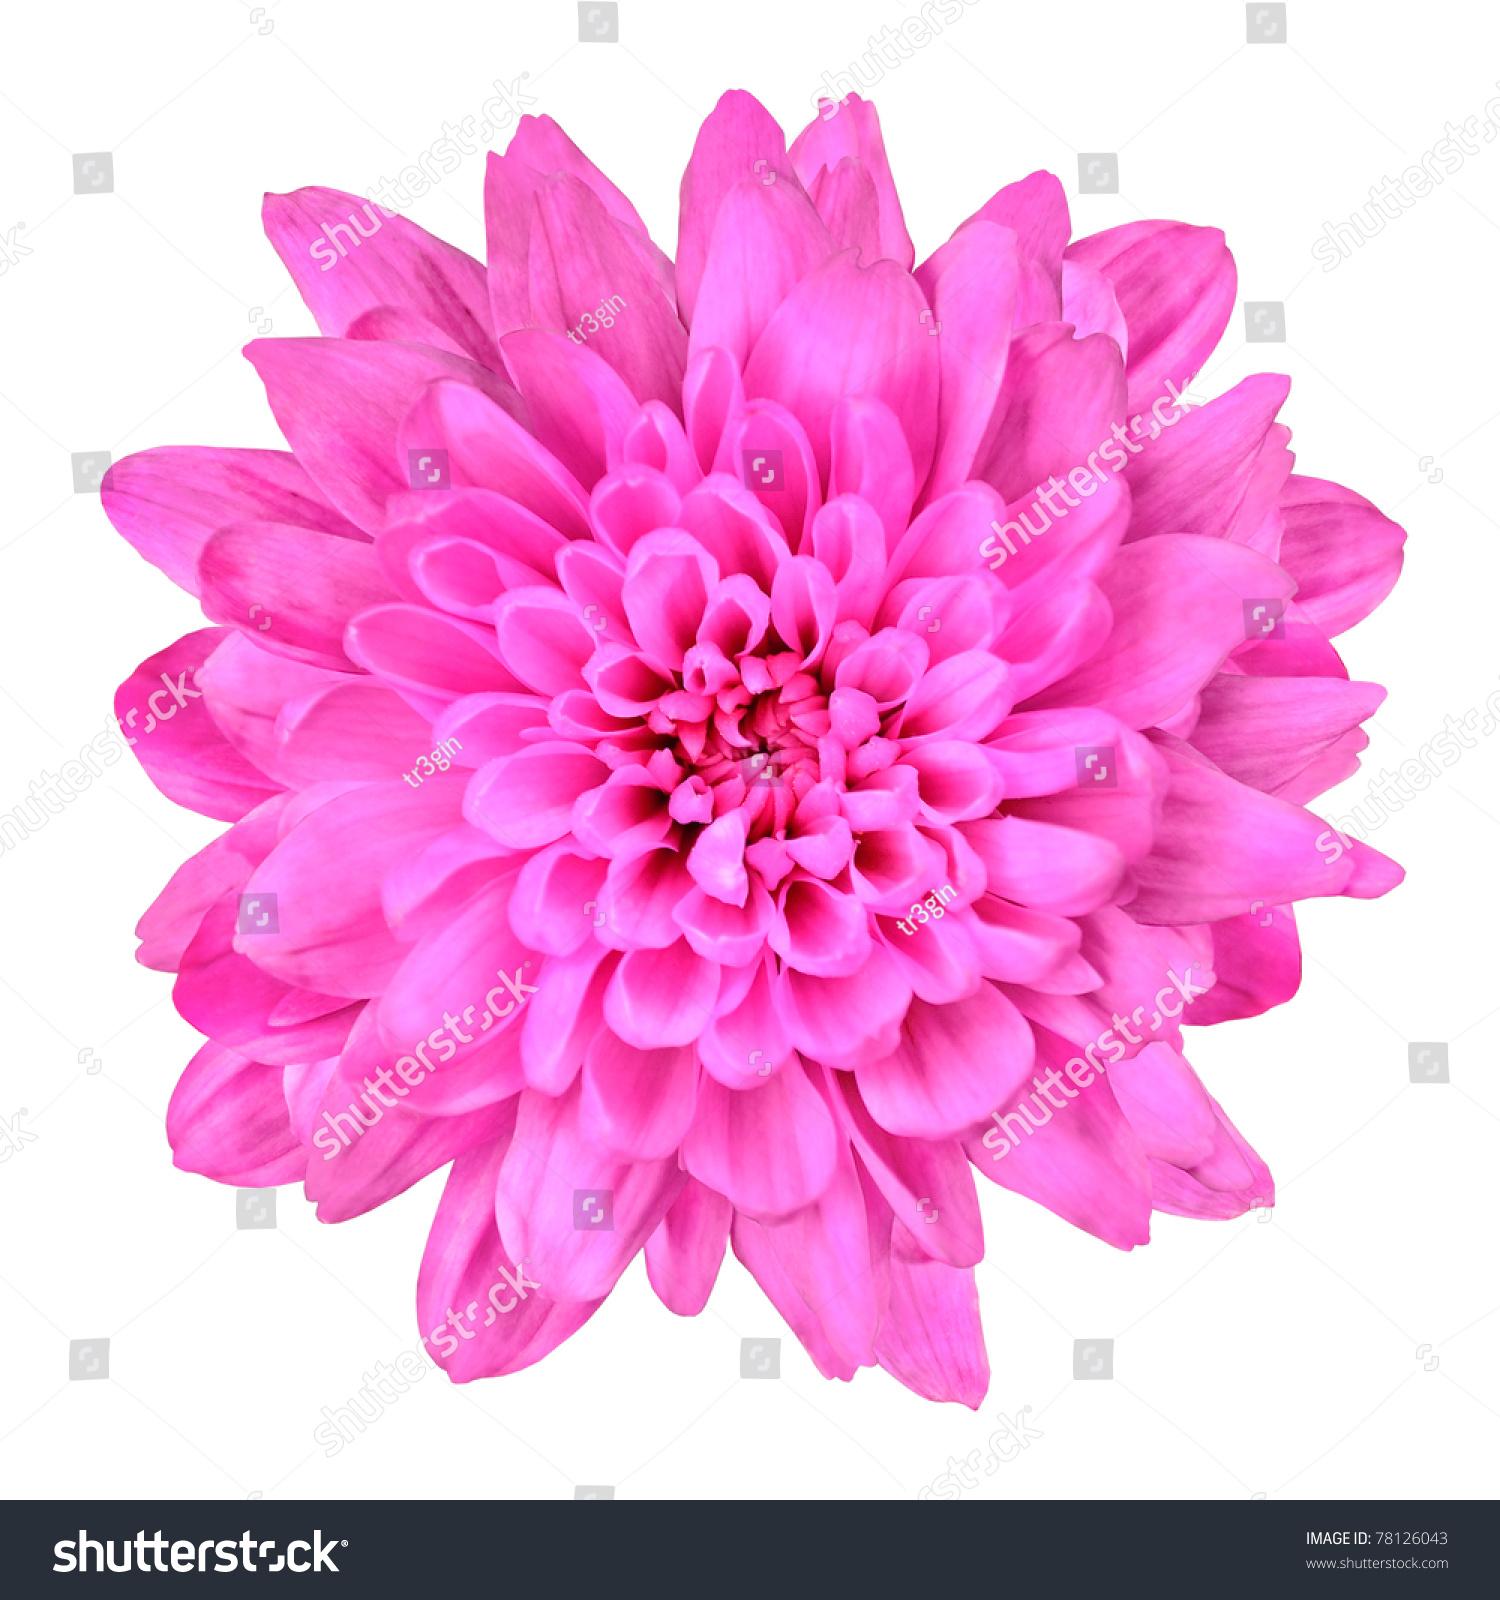 Pink chrysanthemum flower one pink chrysanthemum flower isolated over fotka mightylinksfo